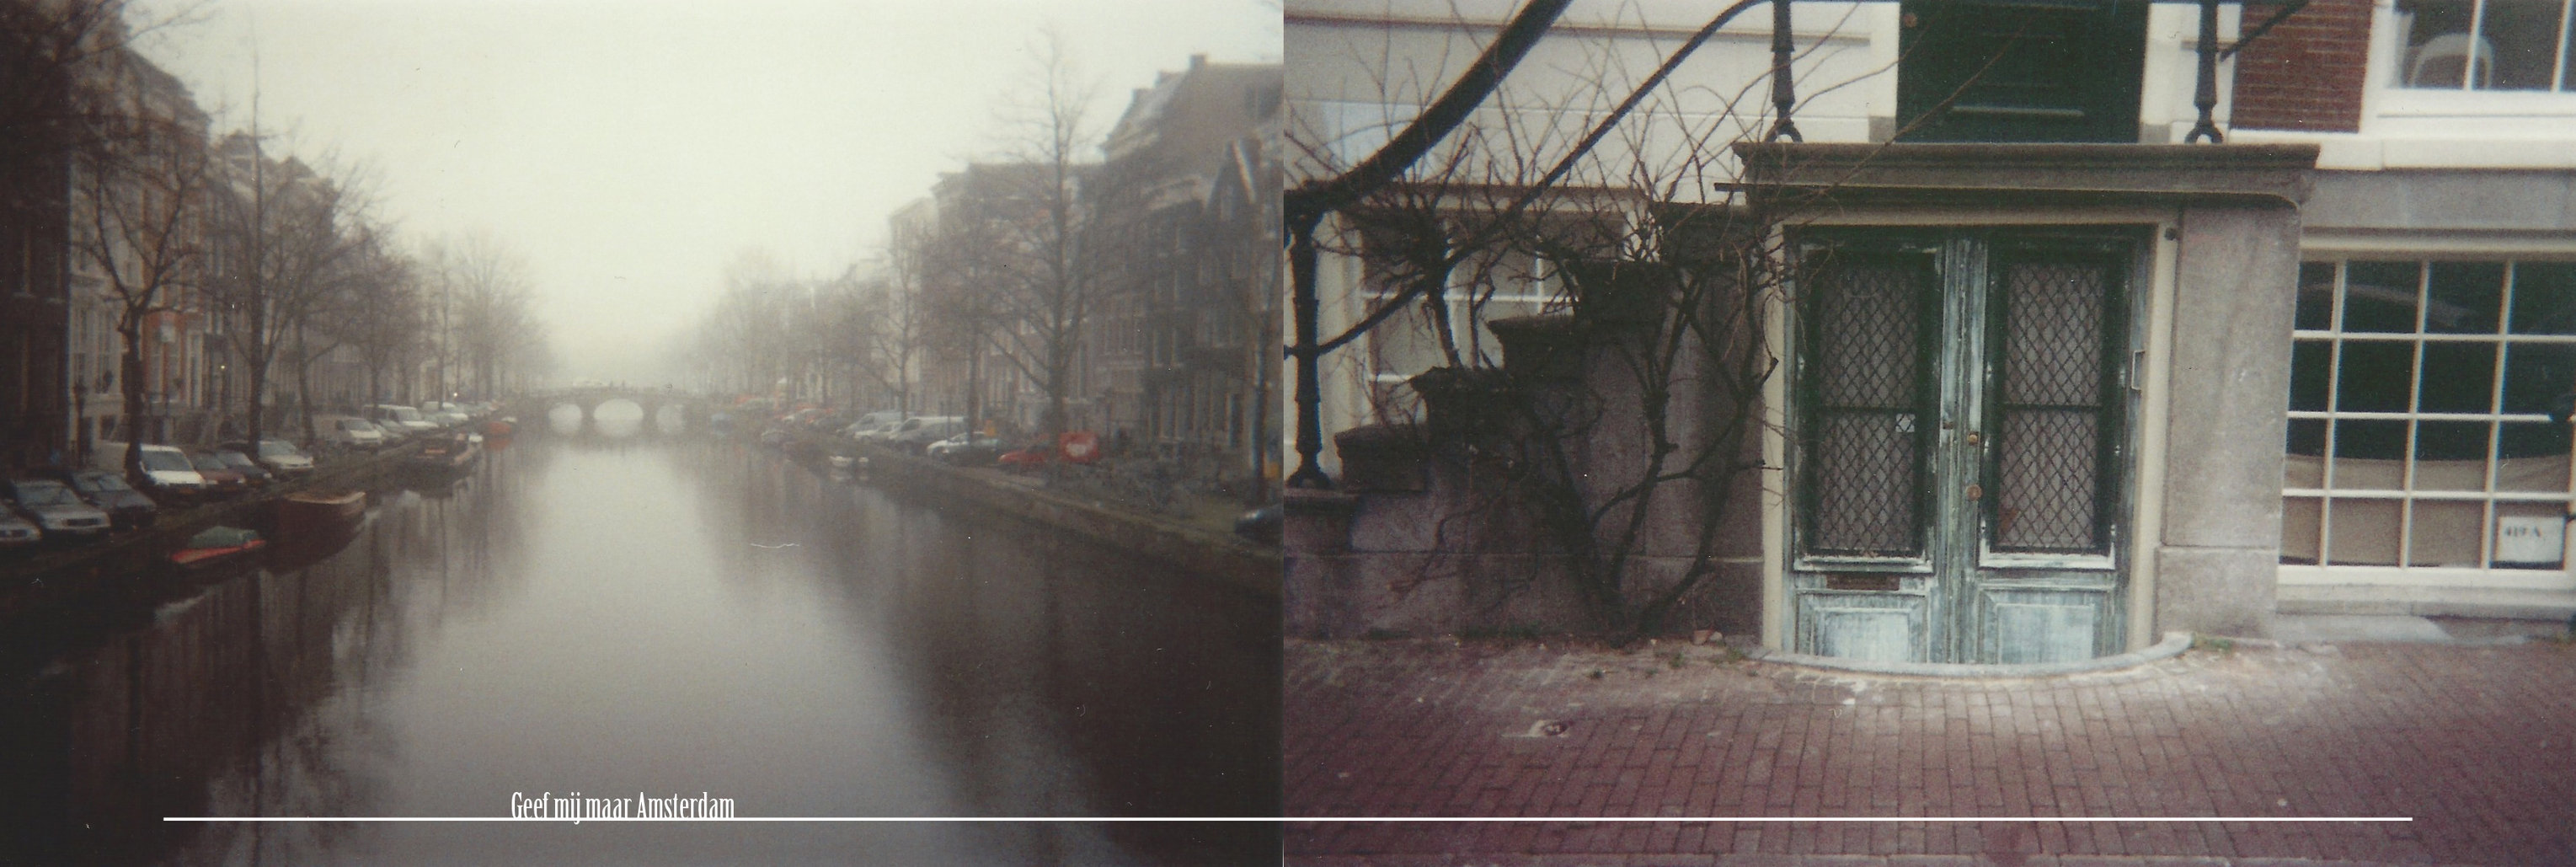 GeefmijmaarAmsterdam.jpg